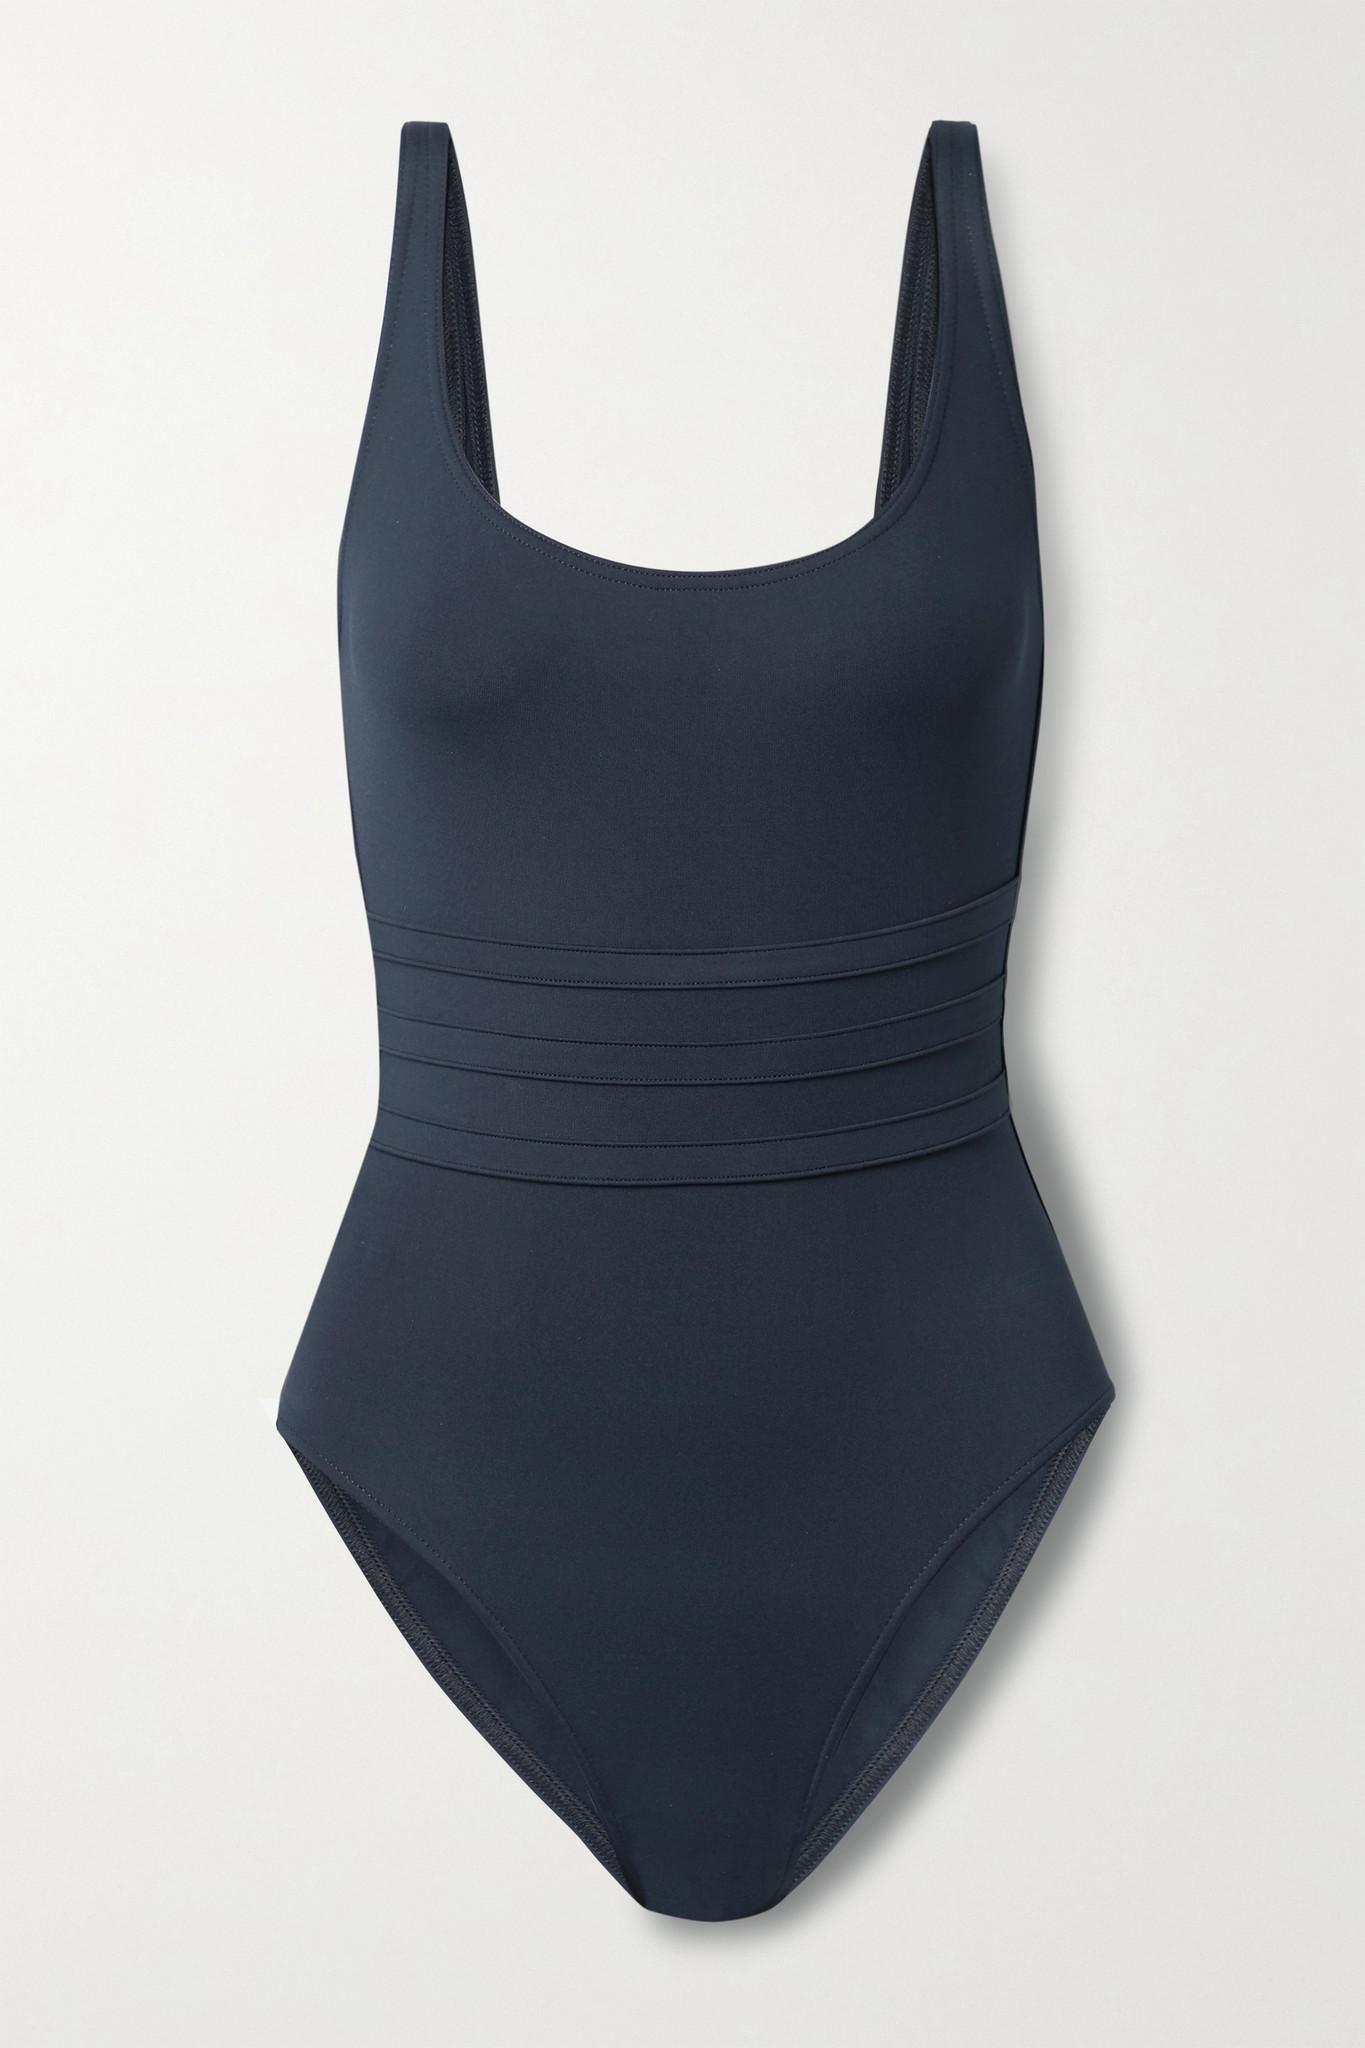 ERES - Les Essentials Asia Swimsuit - Blue - FR40